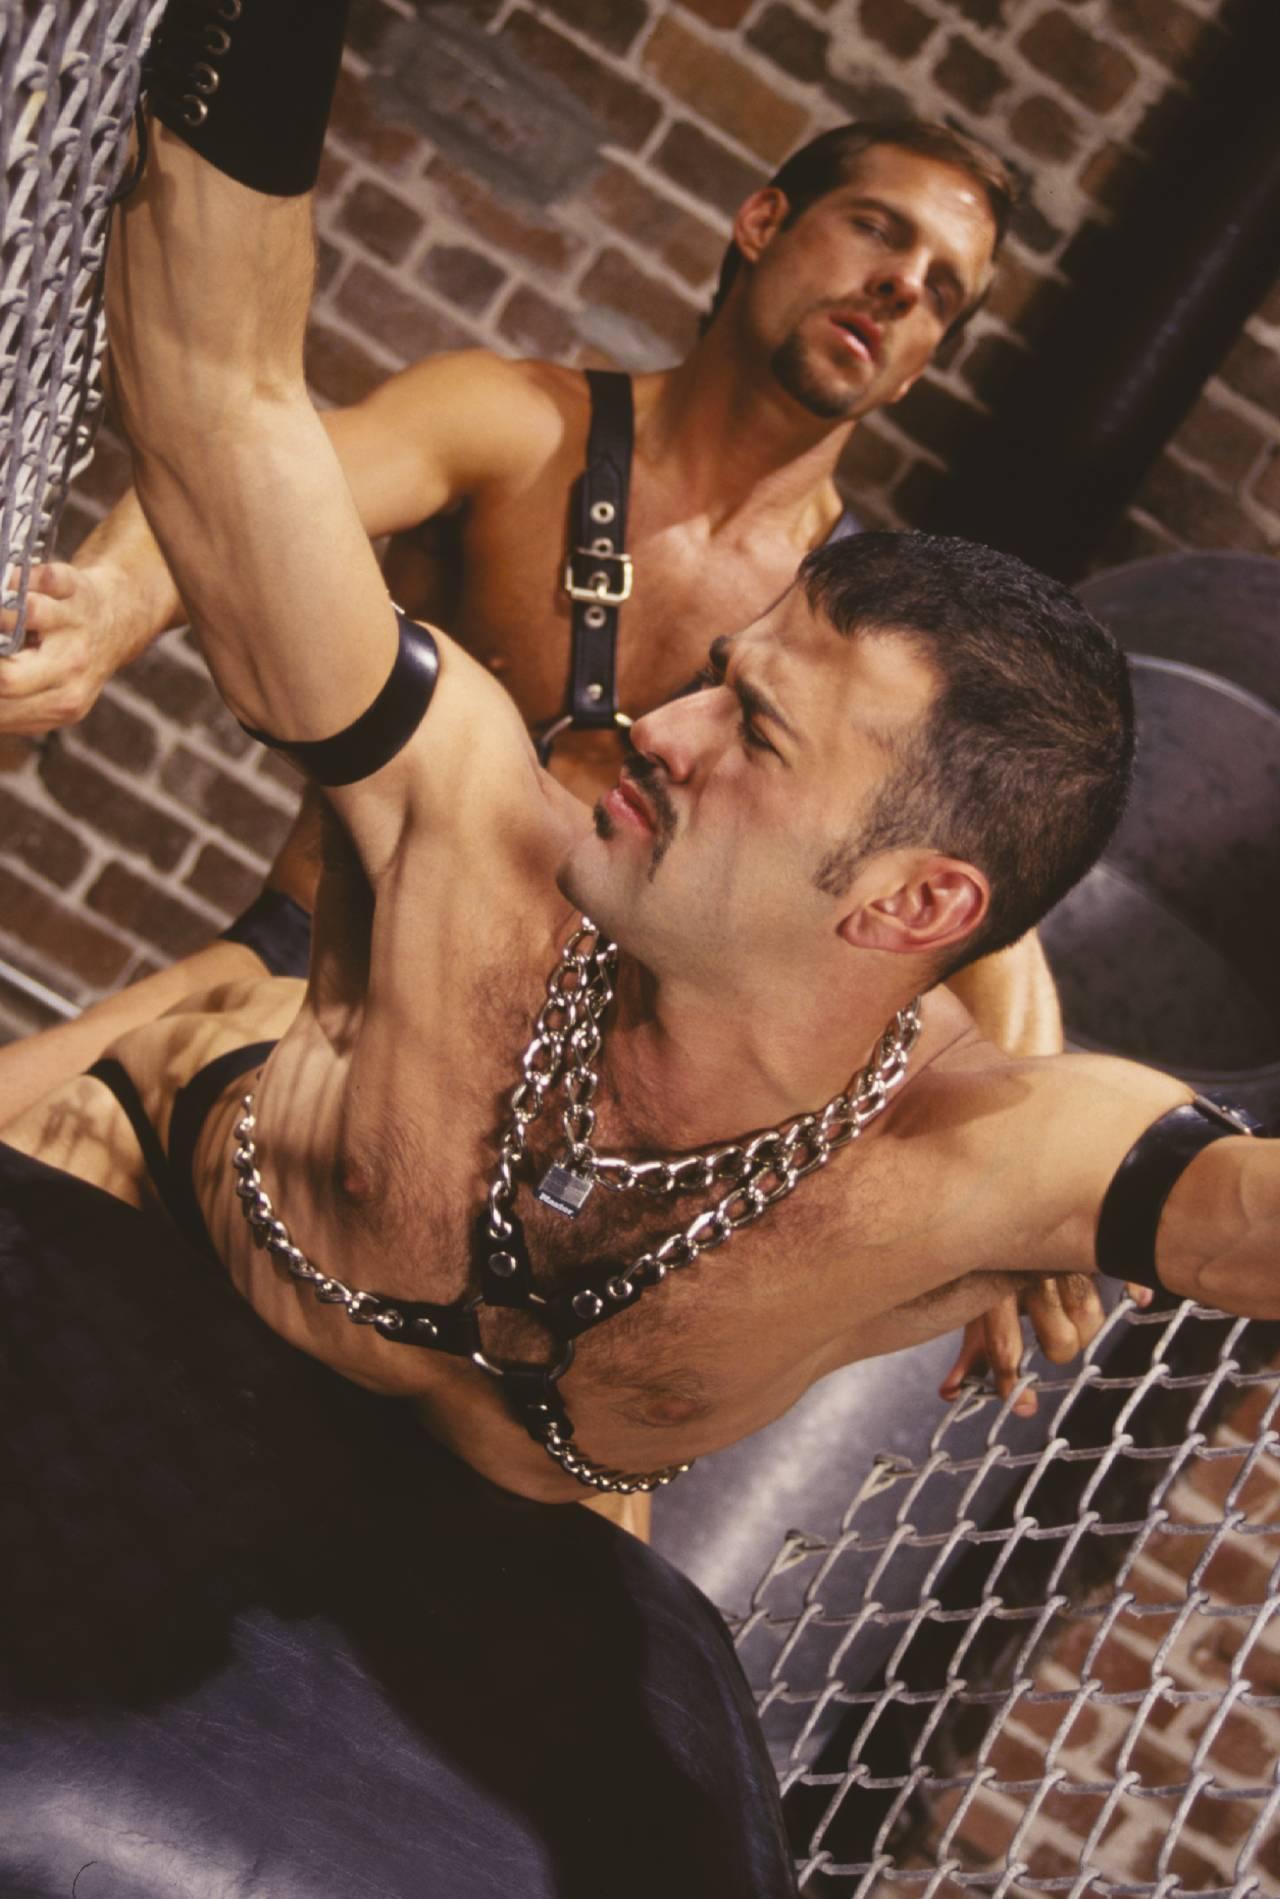 Michael Brandon fuck Michael Soldier gay hot daddy dude men pornSexpack